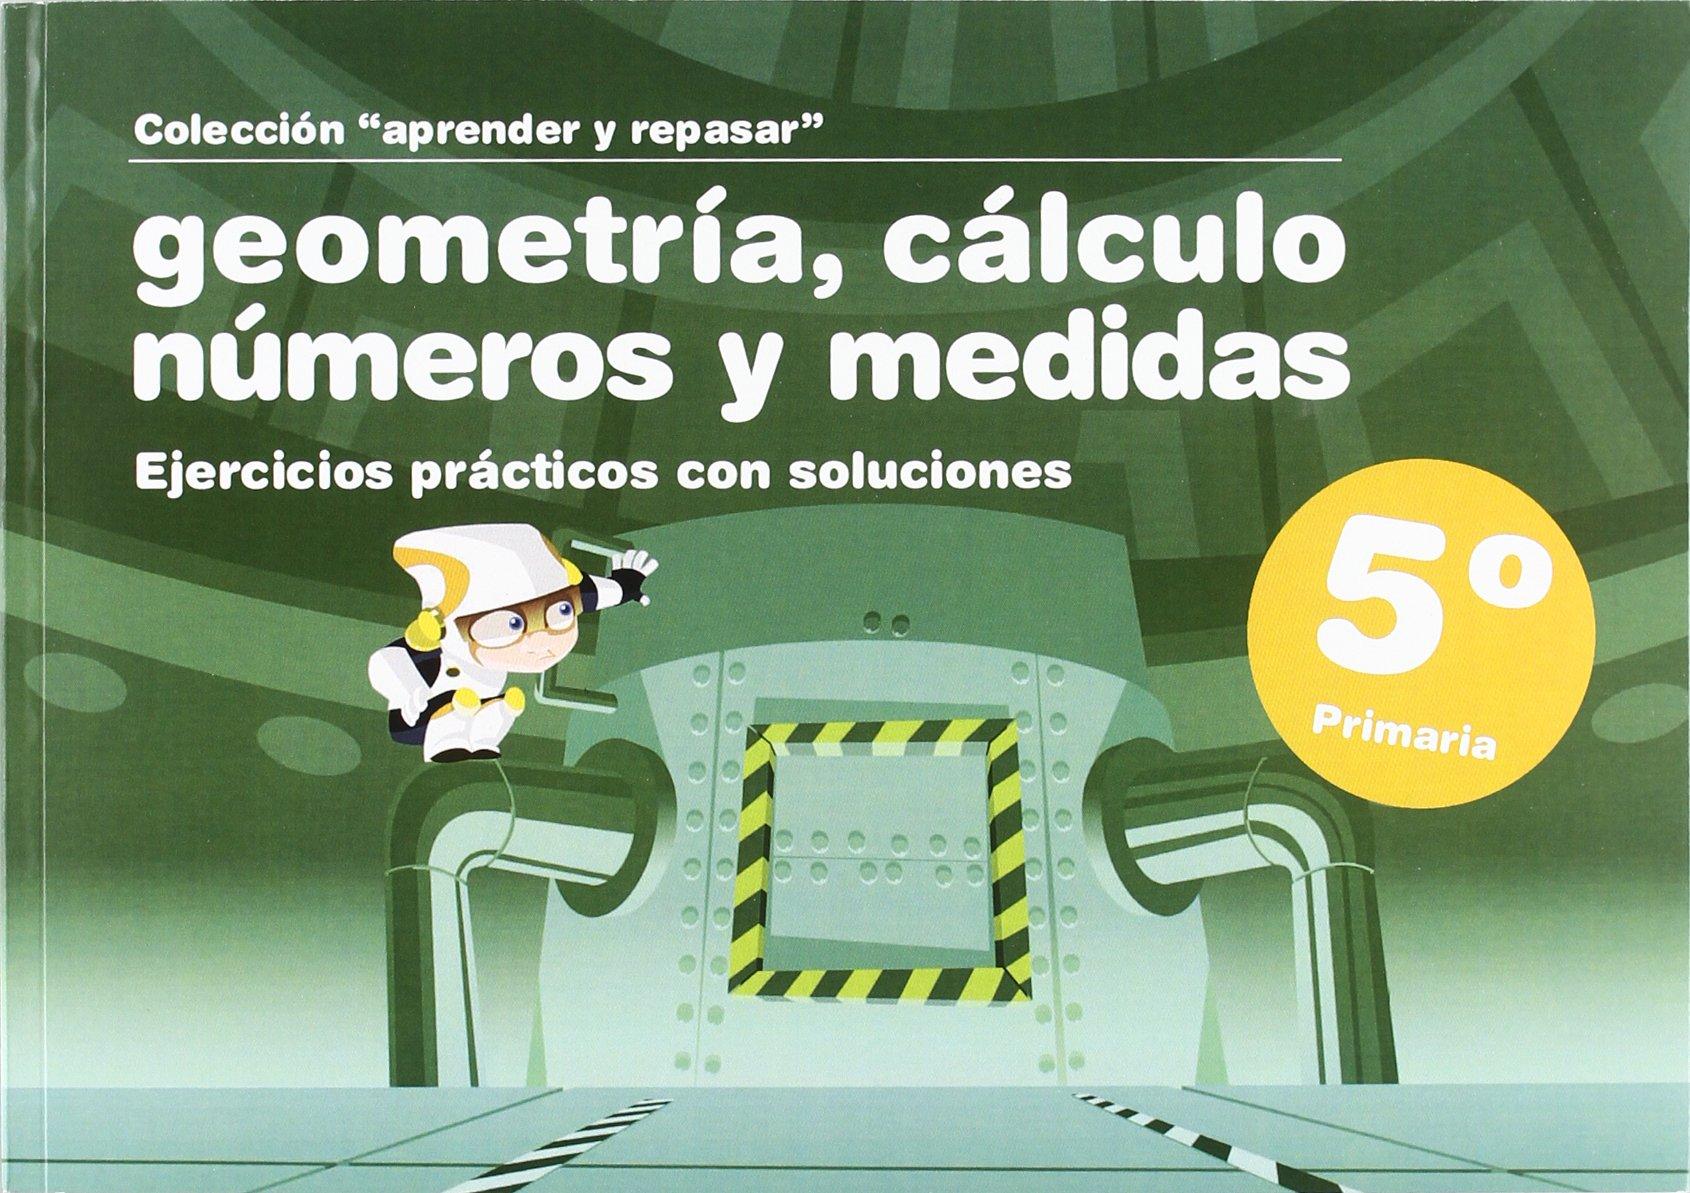 GEOMETRIA CALCULO NUMEROS Y MEDIDAS 5? PRIMARIA (Spanish) Paperback – 2009